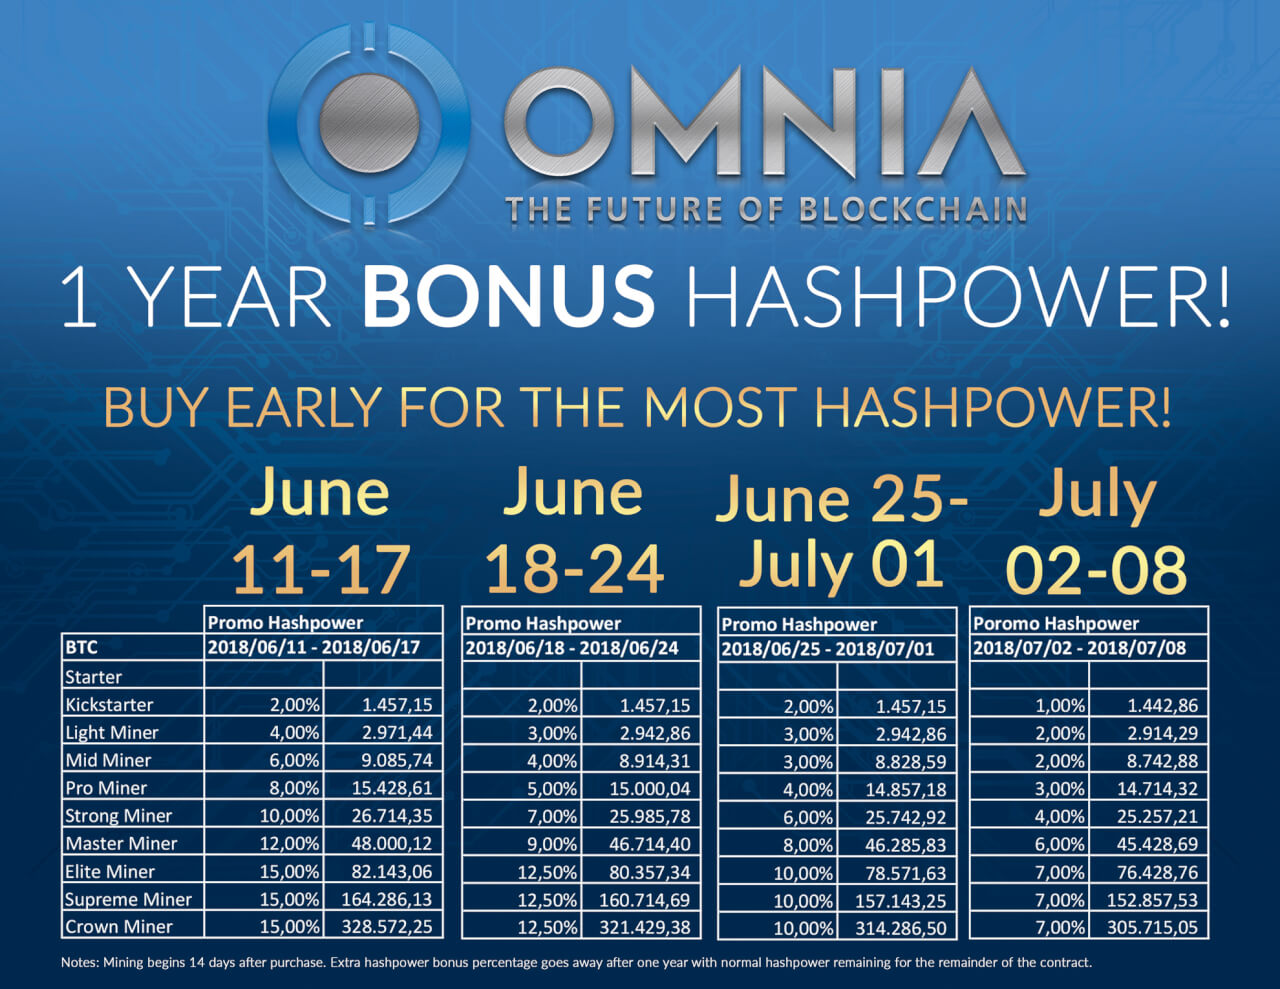 Omnia - летняя промоакция с бонусными мощностями